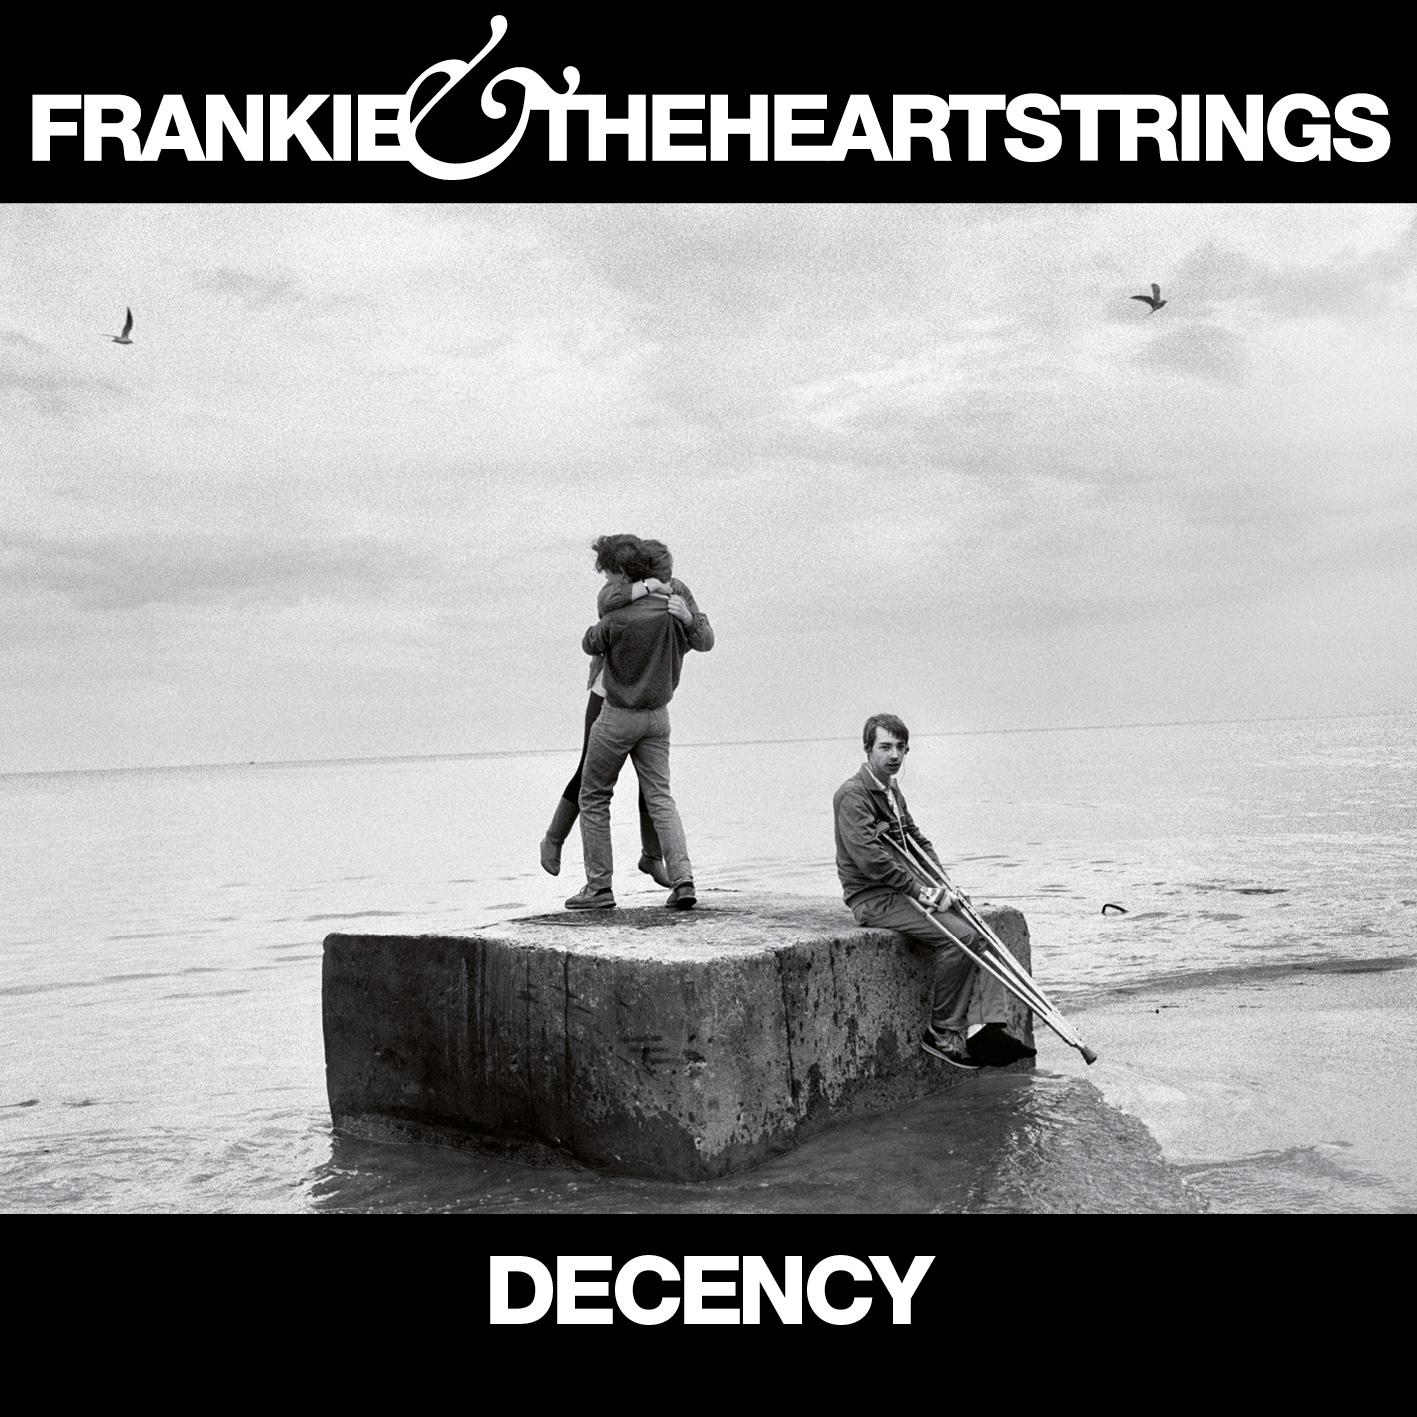 Decency Download (MP3) - Frankie & The Heartstrings